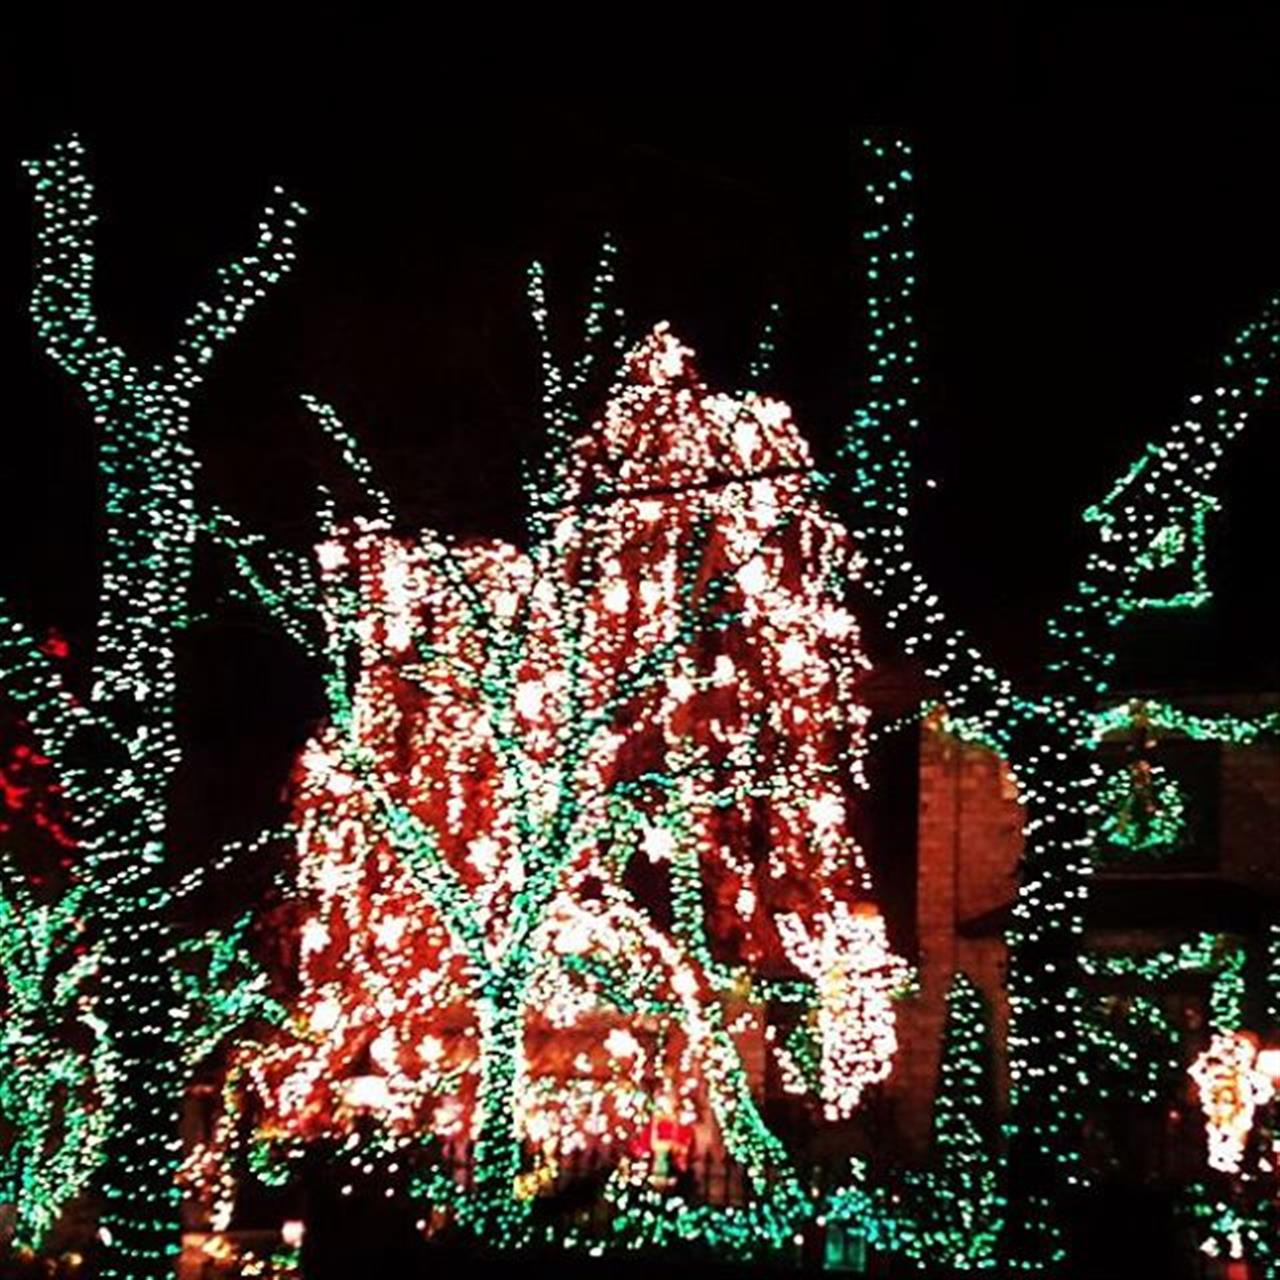 Showing  #christmaslights in #dykerheights . #dykerheightslights2015 #leadingrelocal #happyholidays